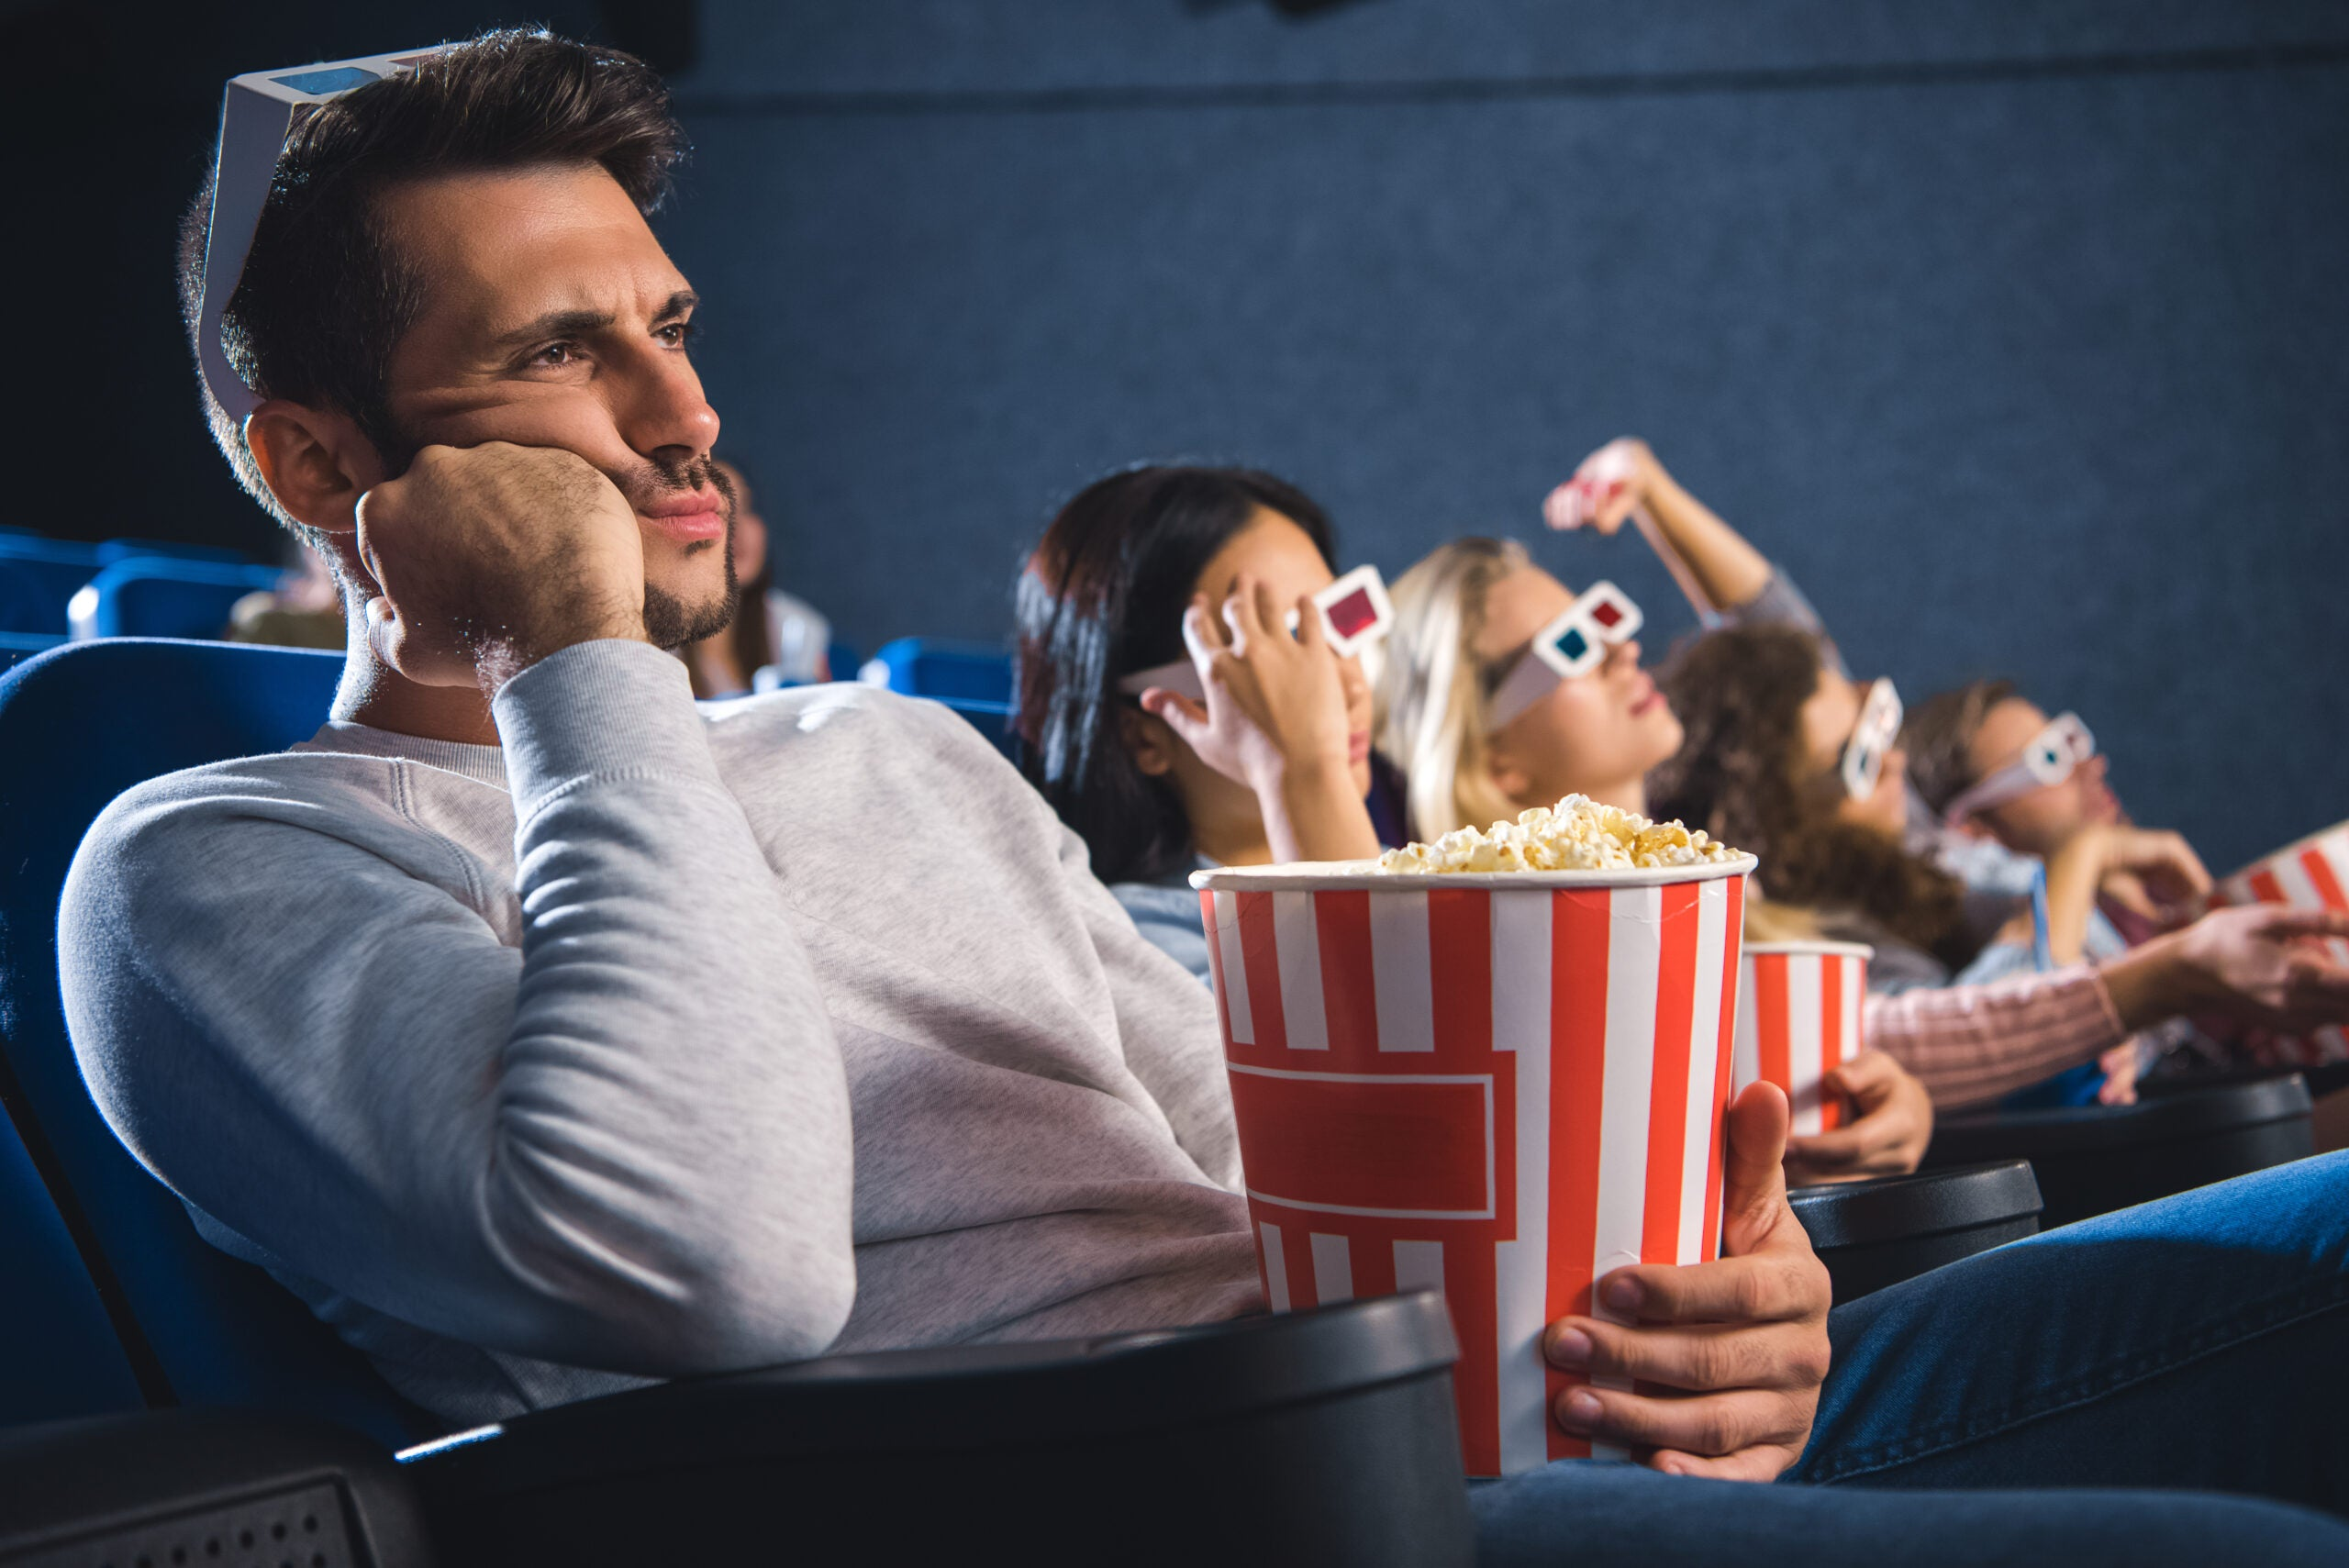 How to avoid the mid-movie bathroom break